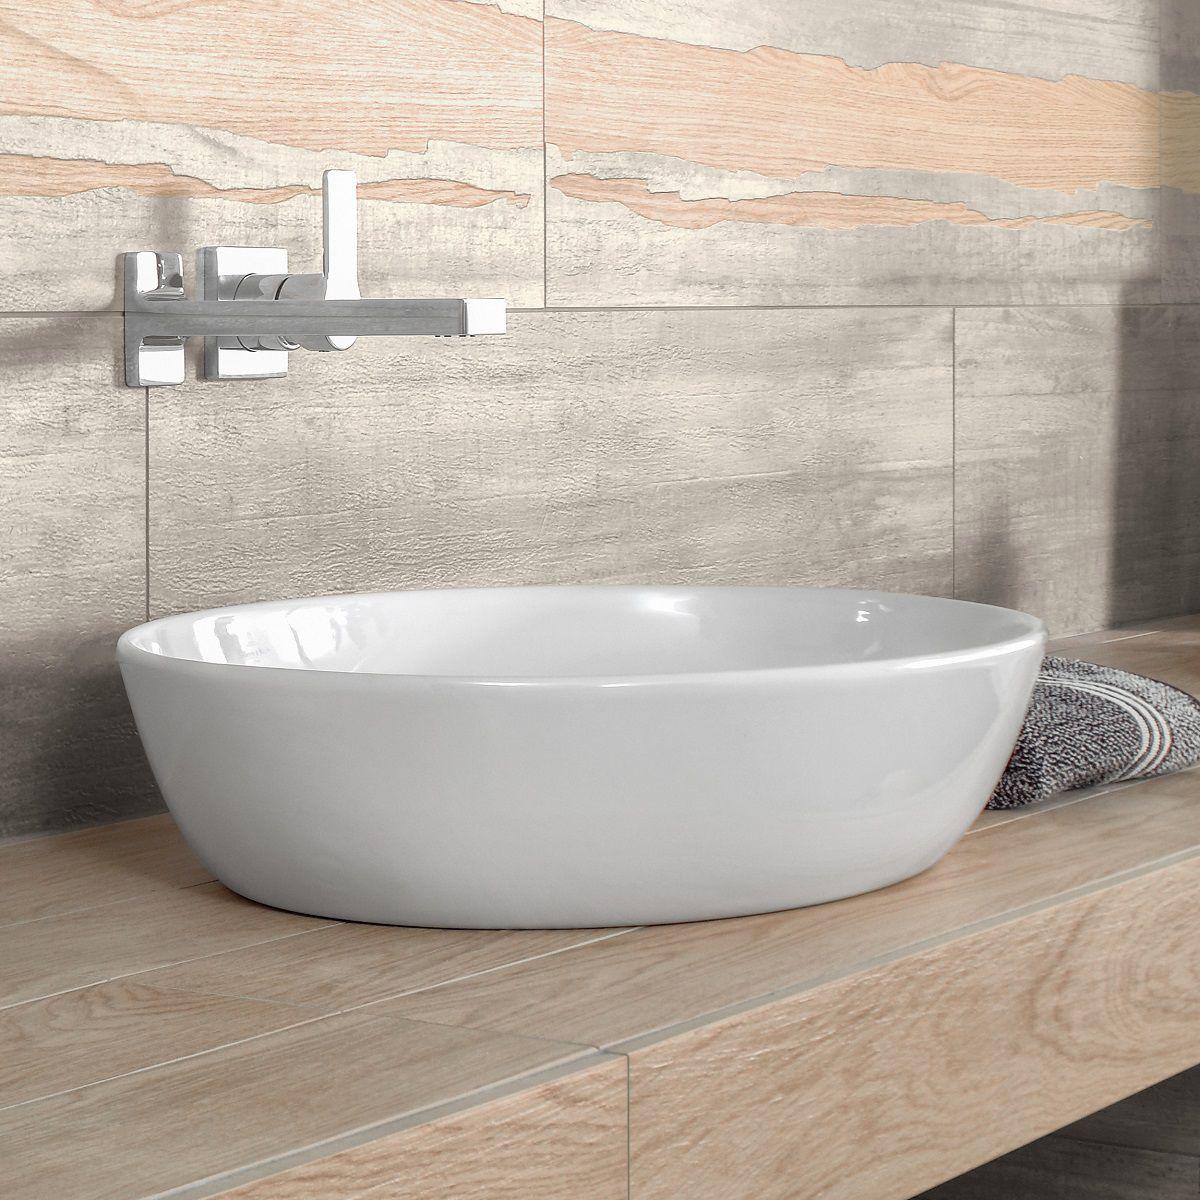 Villeroy & Boch Artis Round Surface Mounted Basin   Bathrooms ...